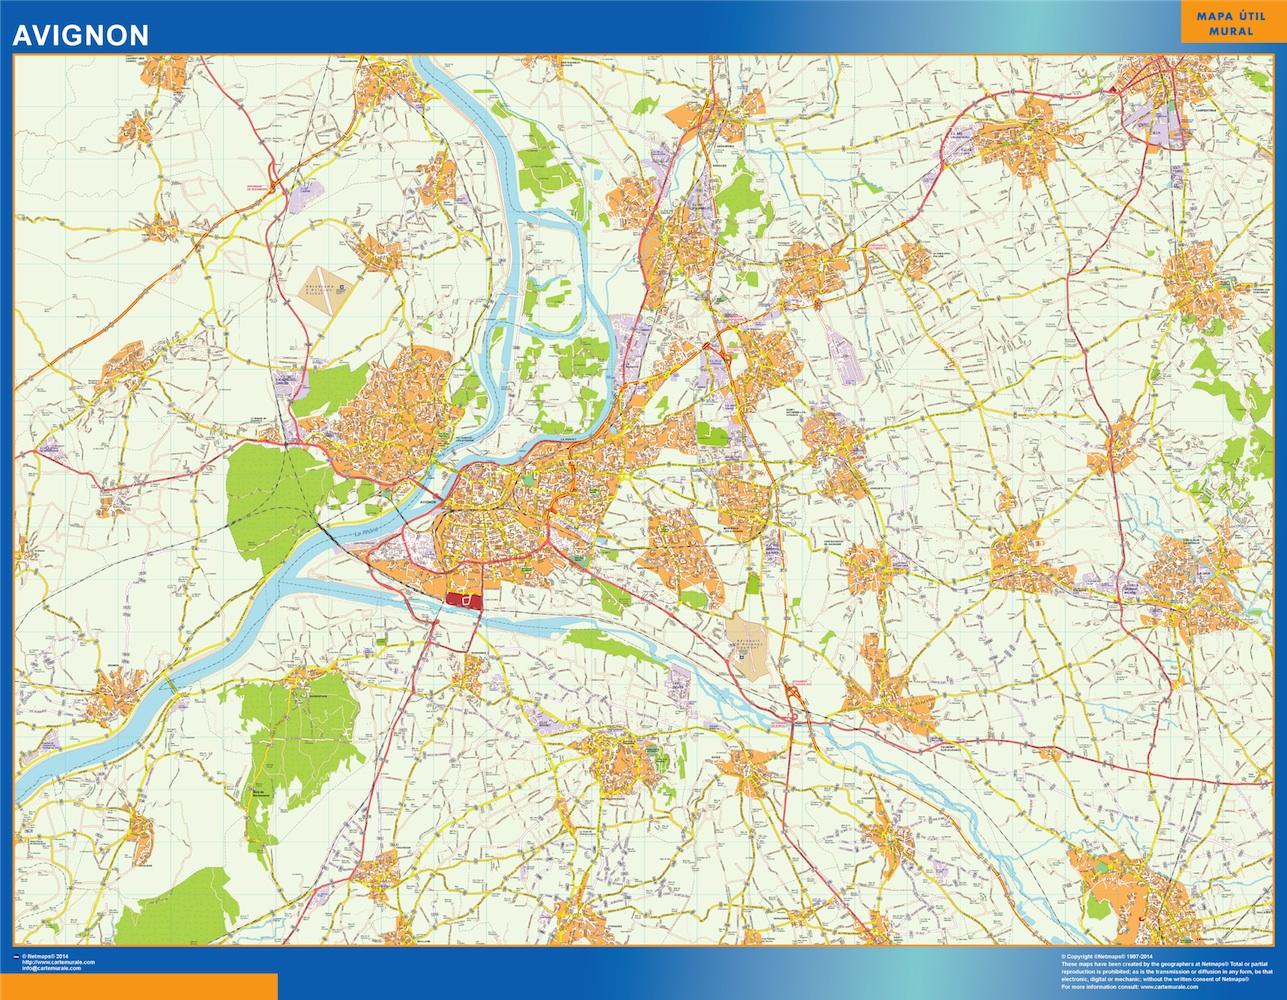 Mapa Avignon en Francia plastificado gigante